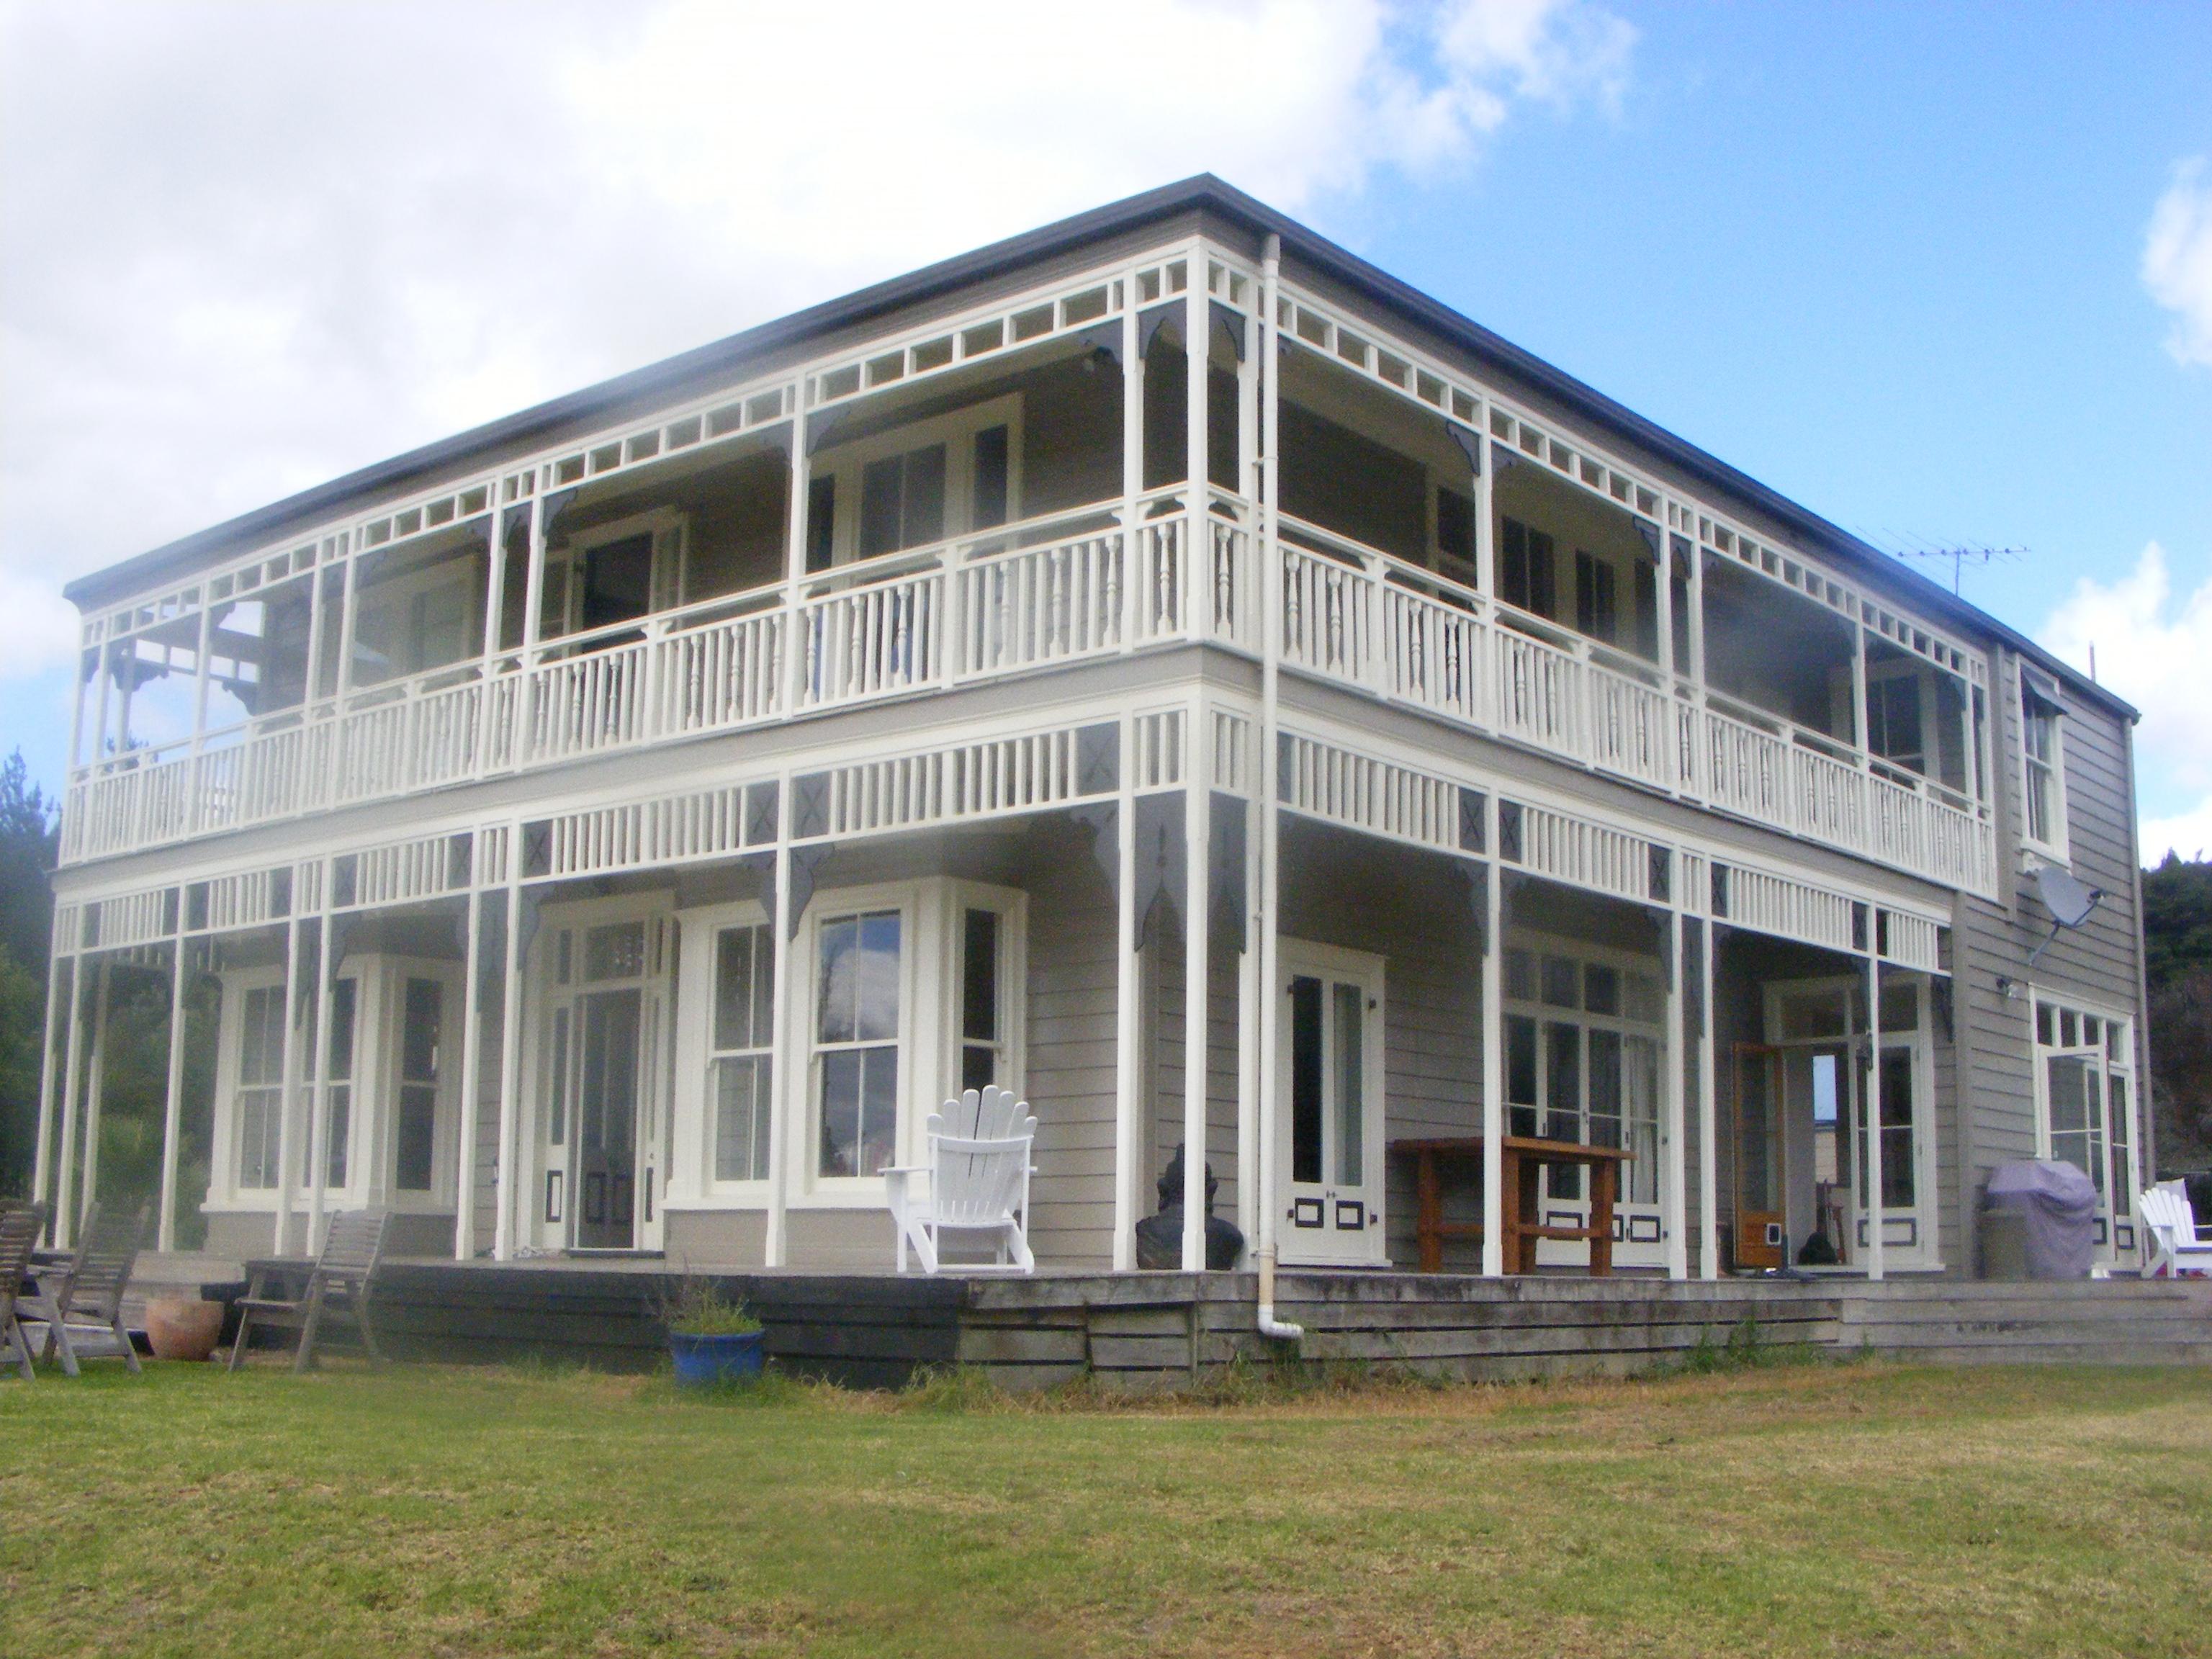 House Painted 1900 Villa